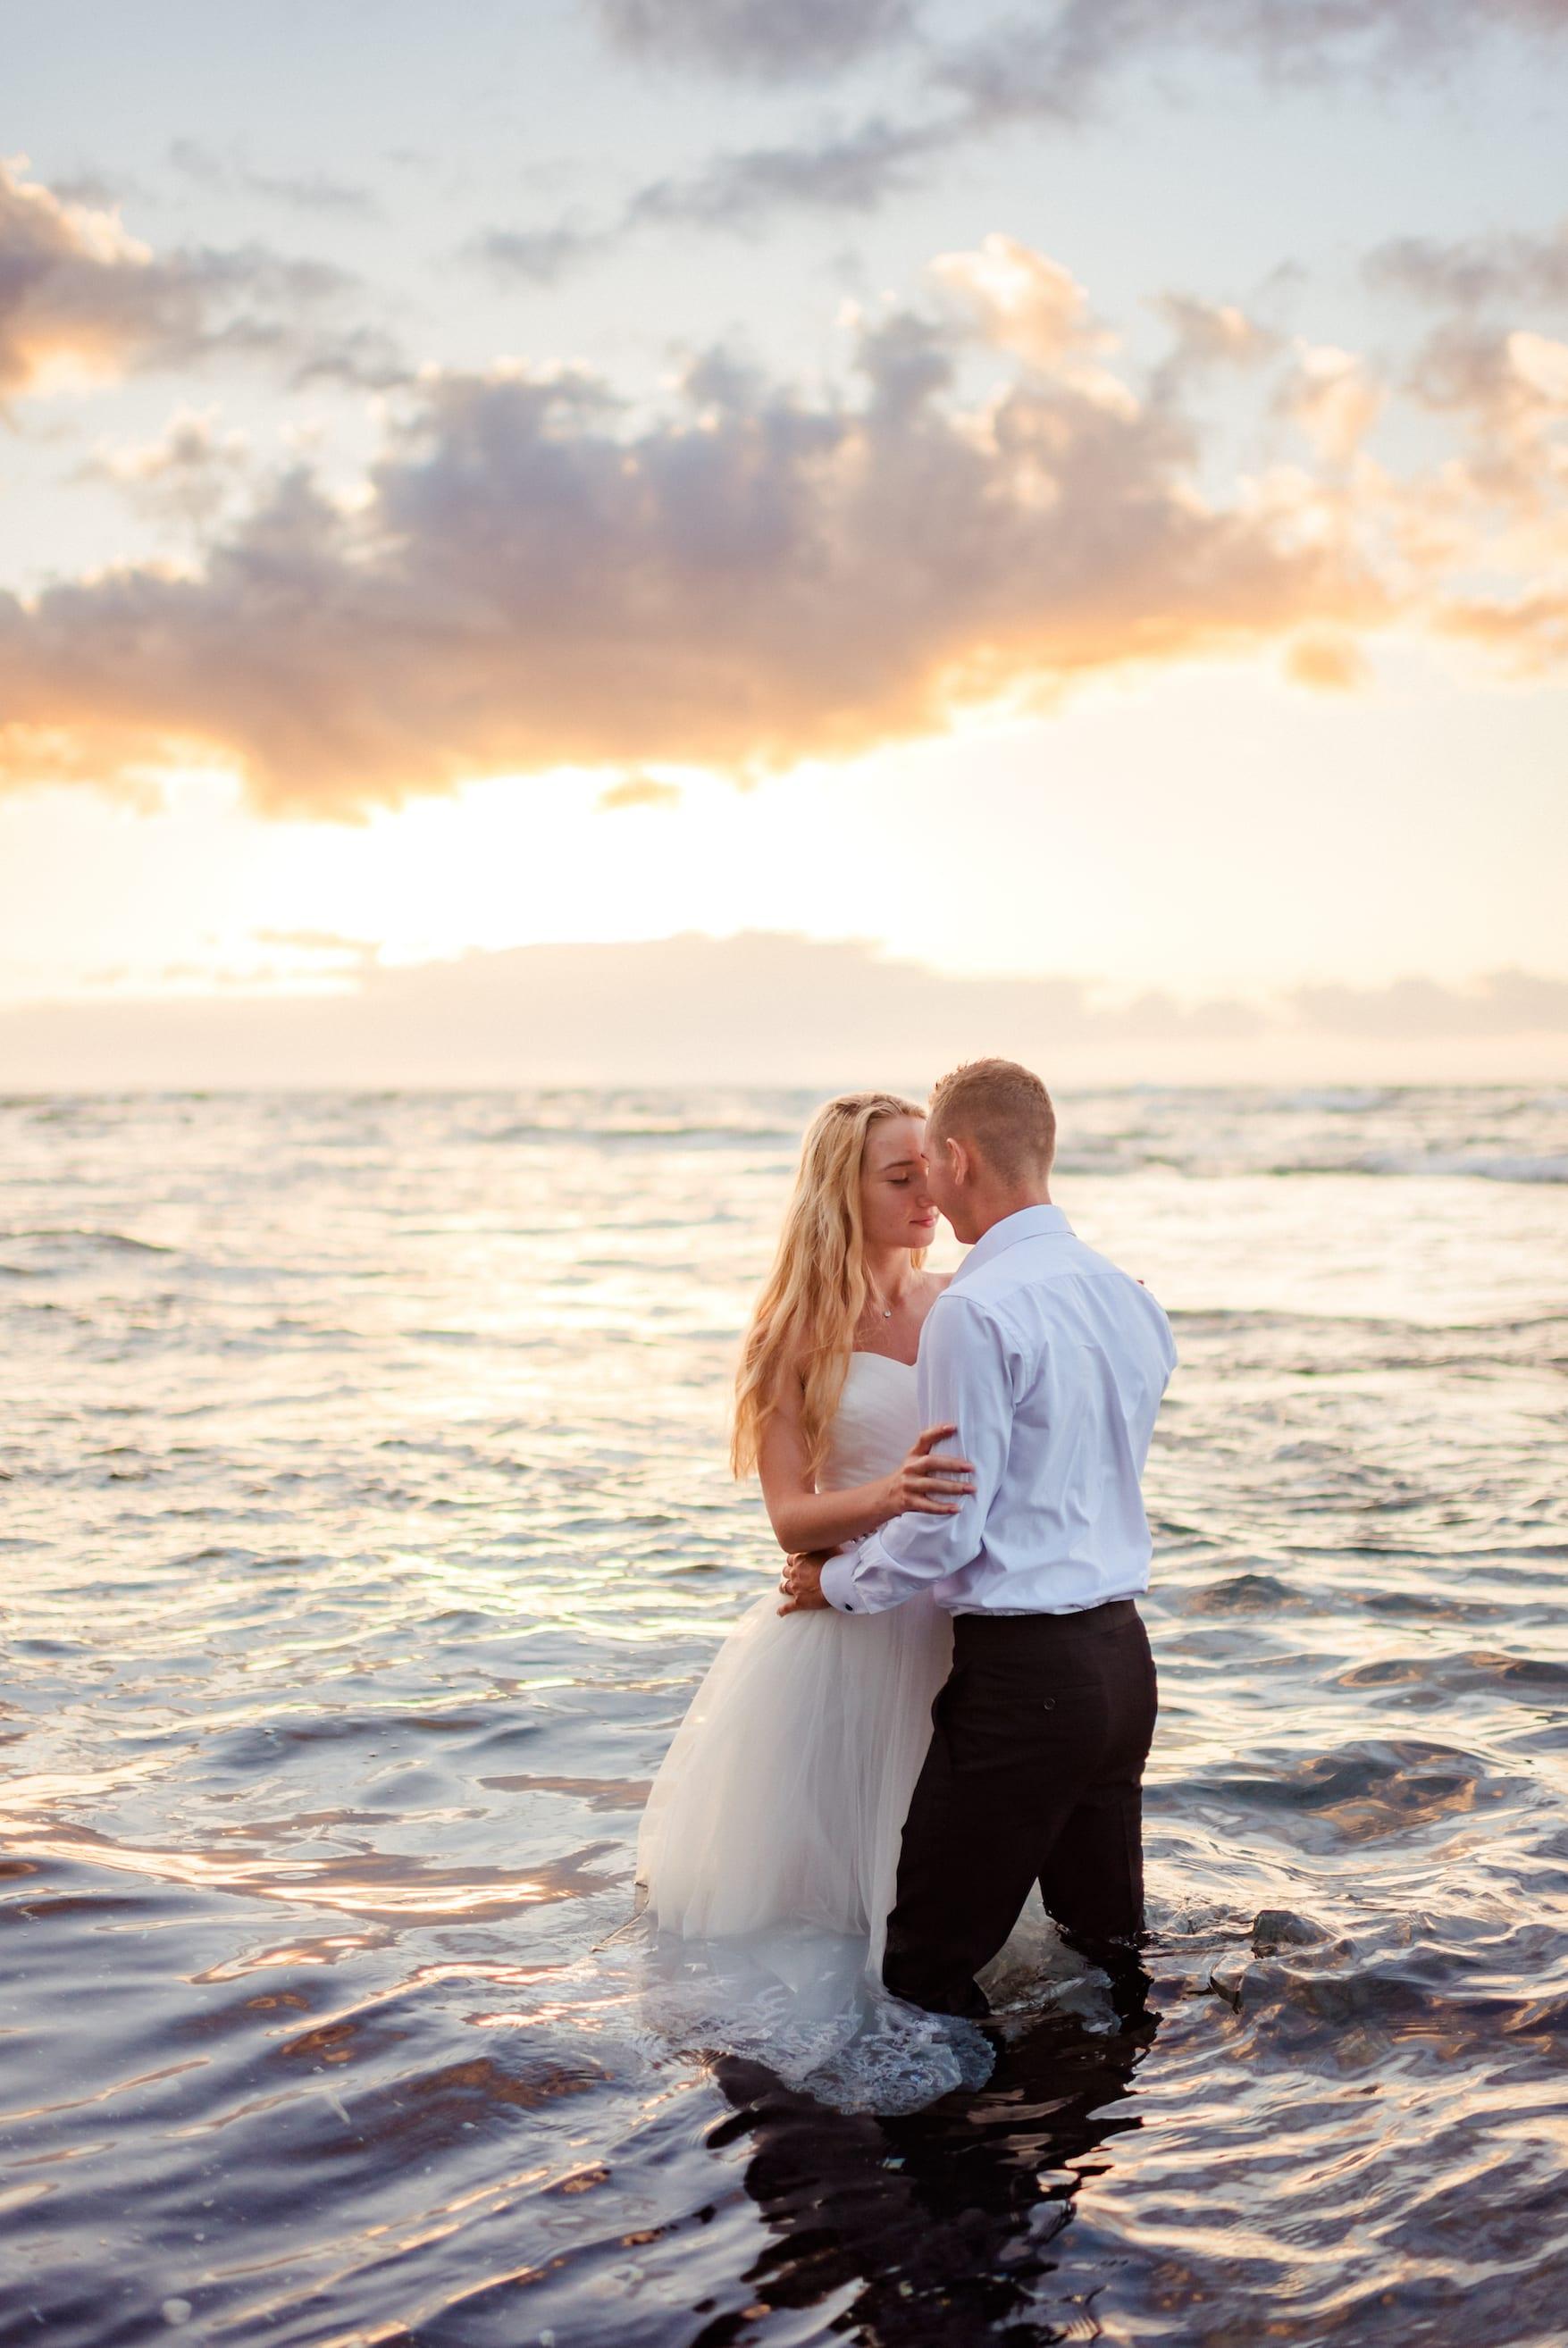 Big-Island-Elopement-Private-Wedding-Hawaii-Beach-13.jpg